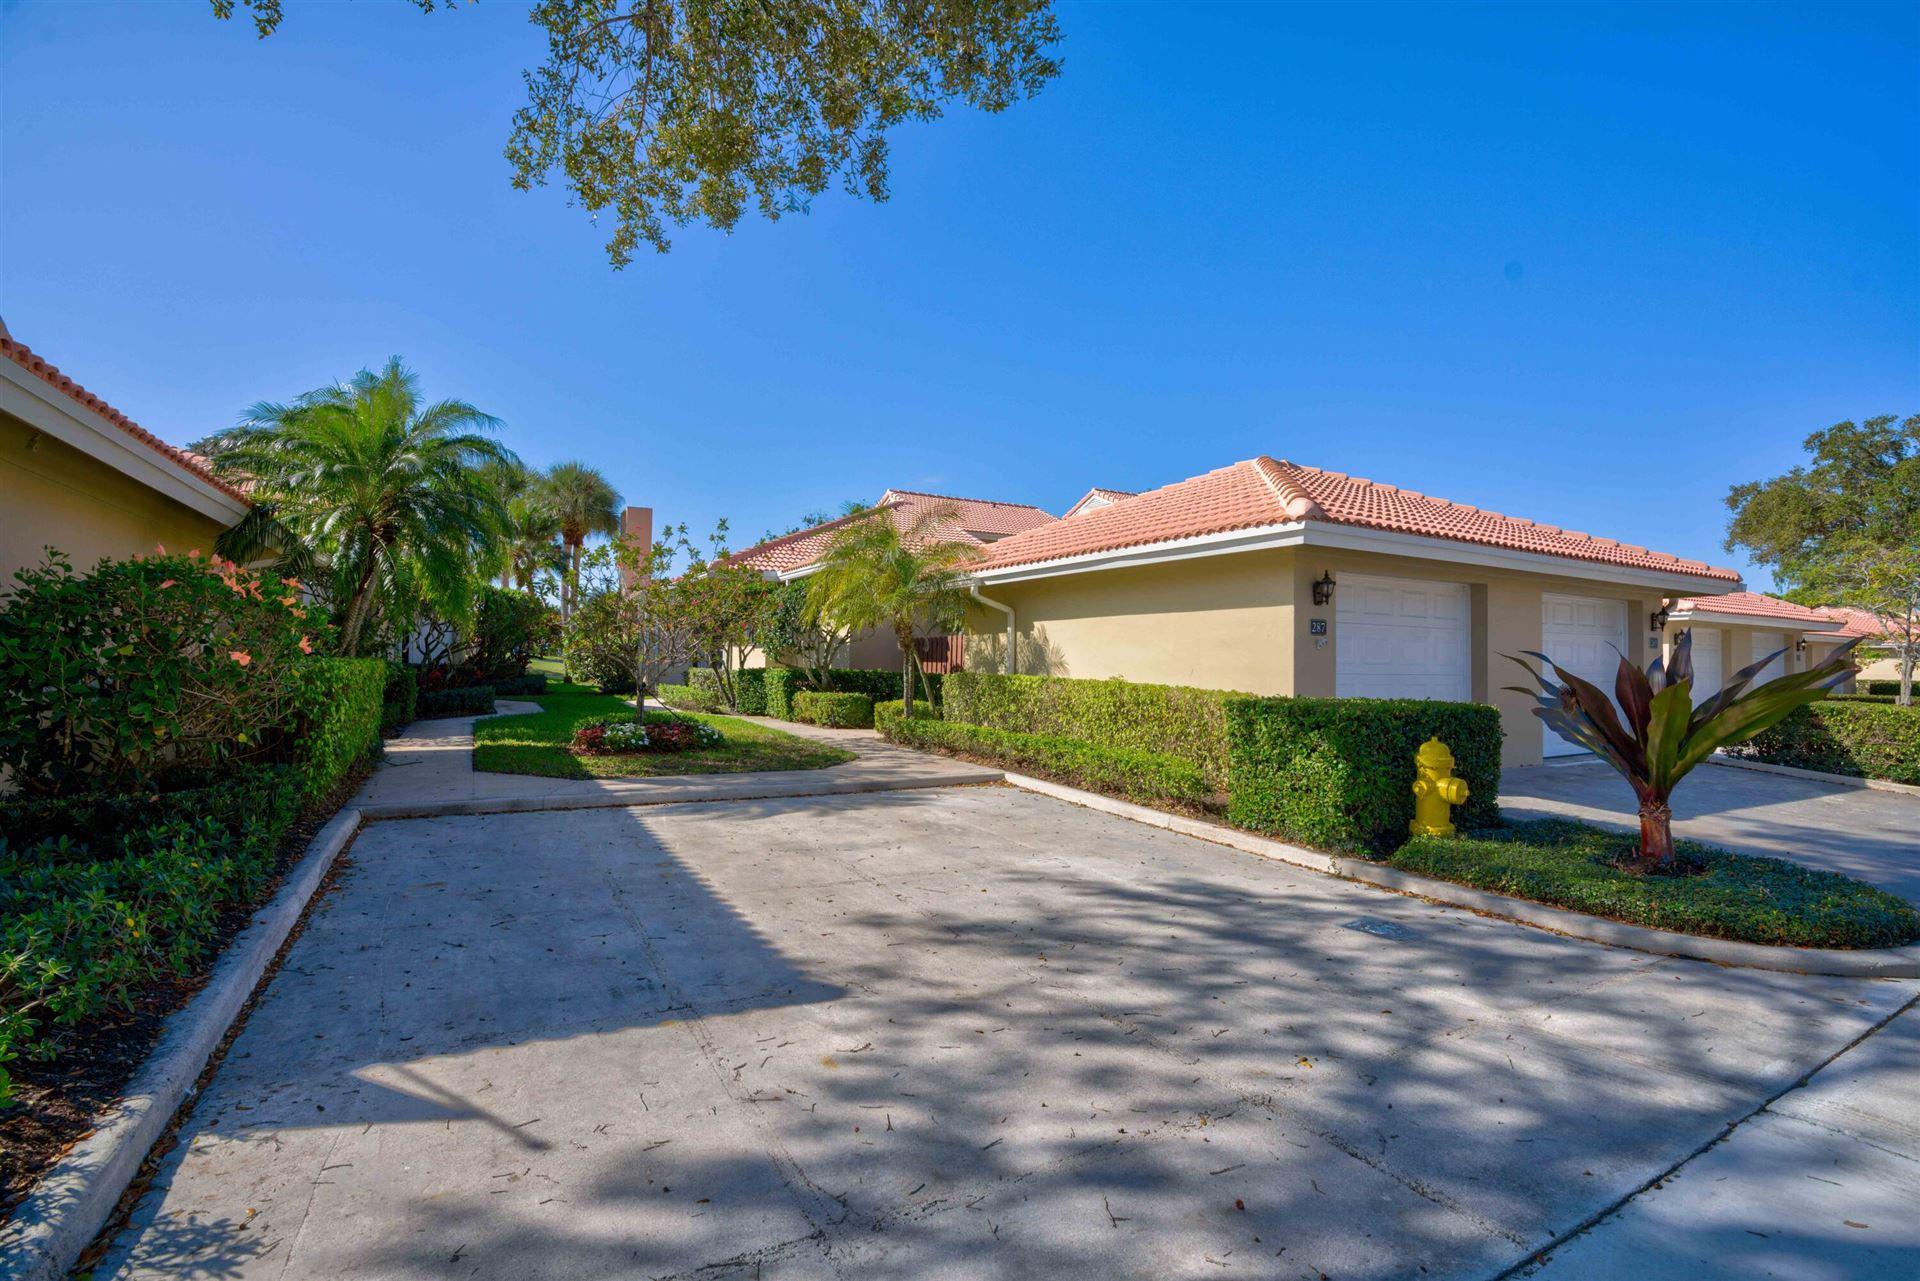 Photo of 287 Old Meadow Way, Palm Beach Gardens, FL 33418 (MLS # RX-10694331)